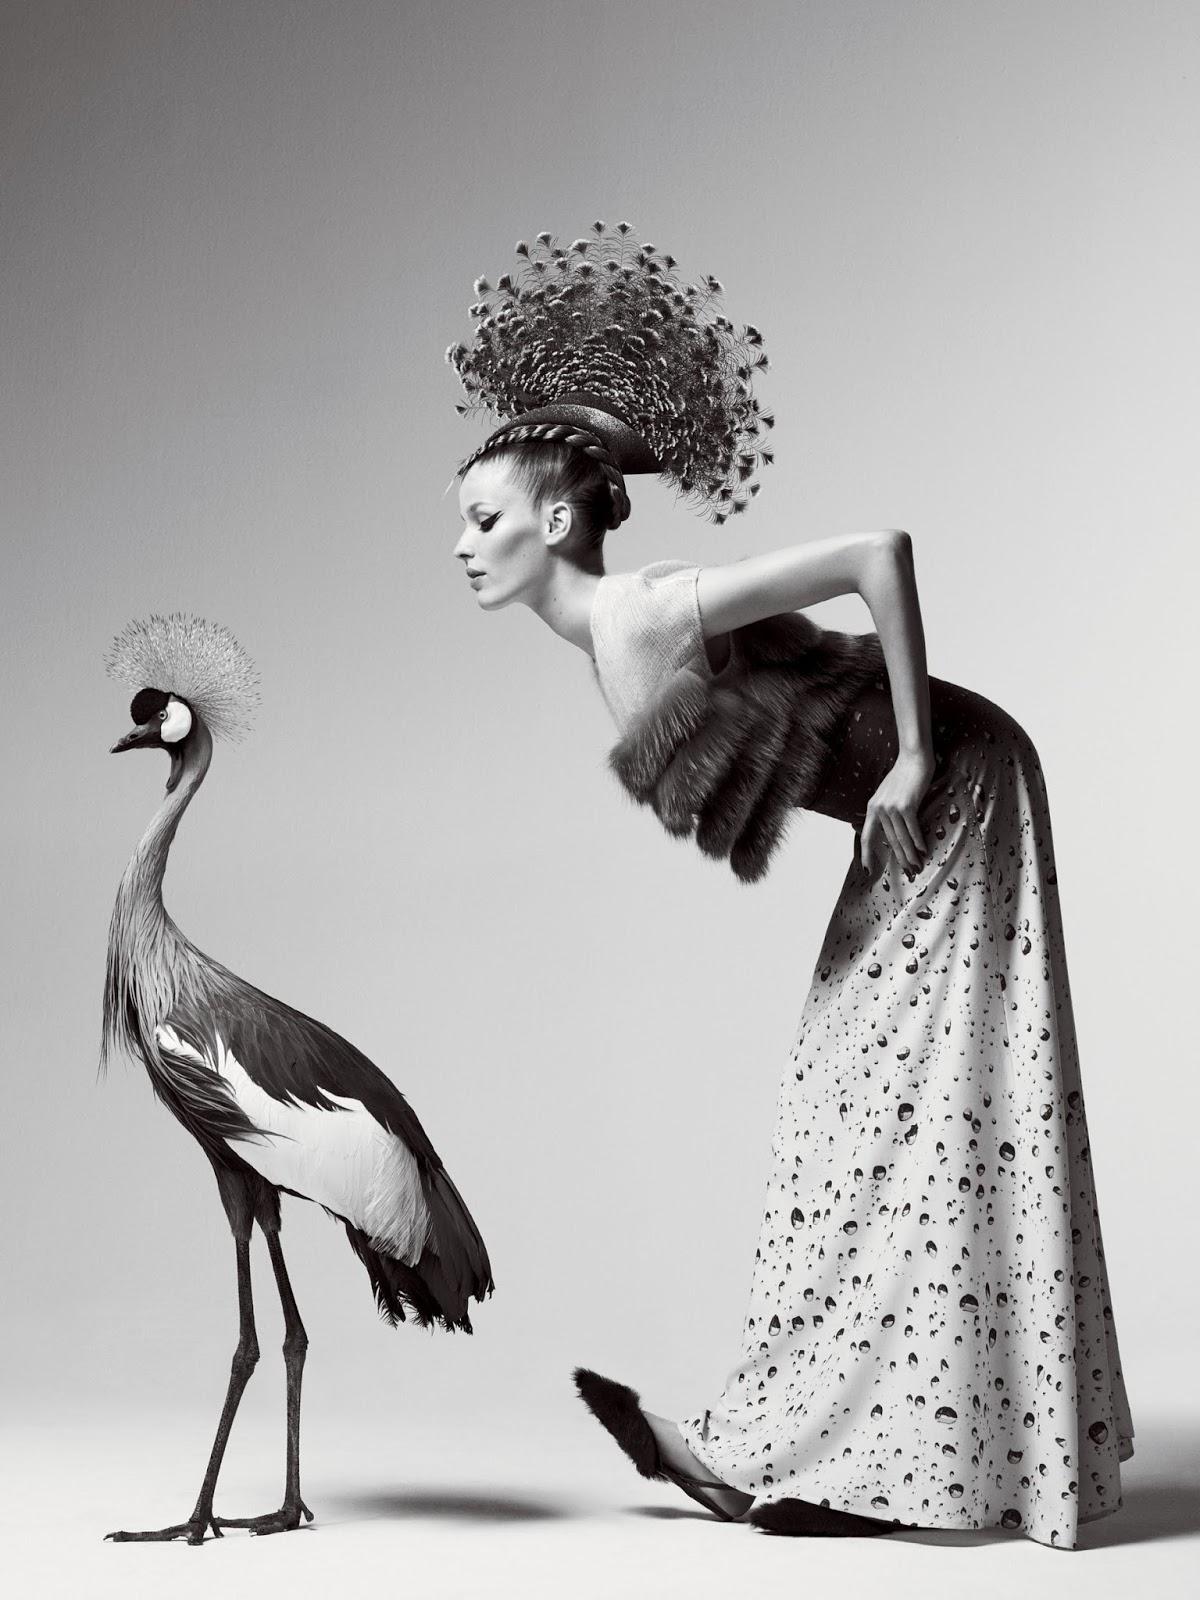 Fashion photography art black and white